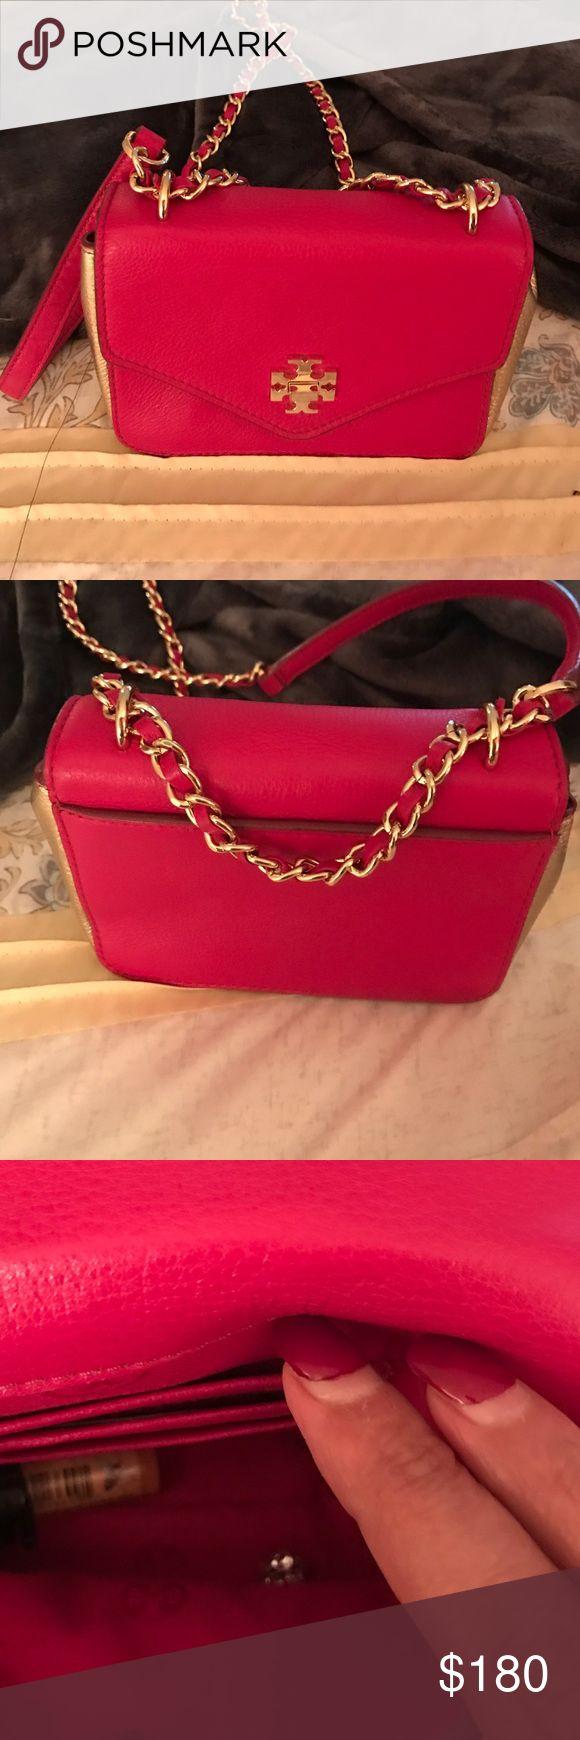 Pink Tory butch bag Worn five times only Tory Burch Bags Mini Bags